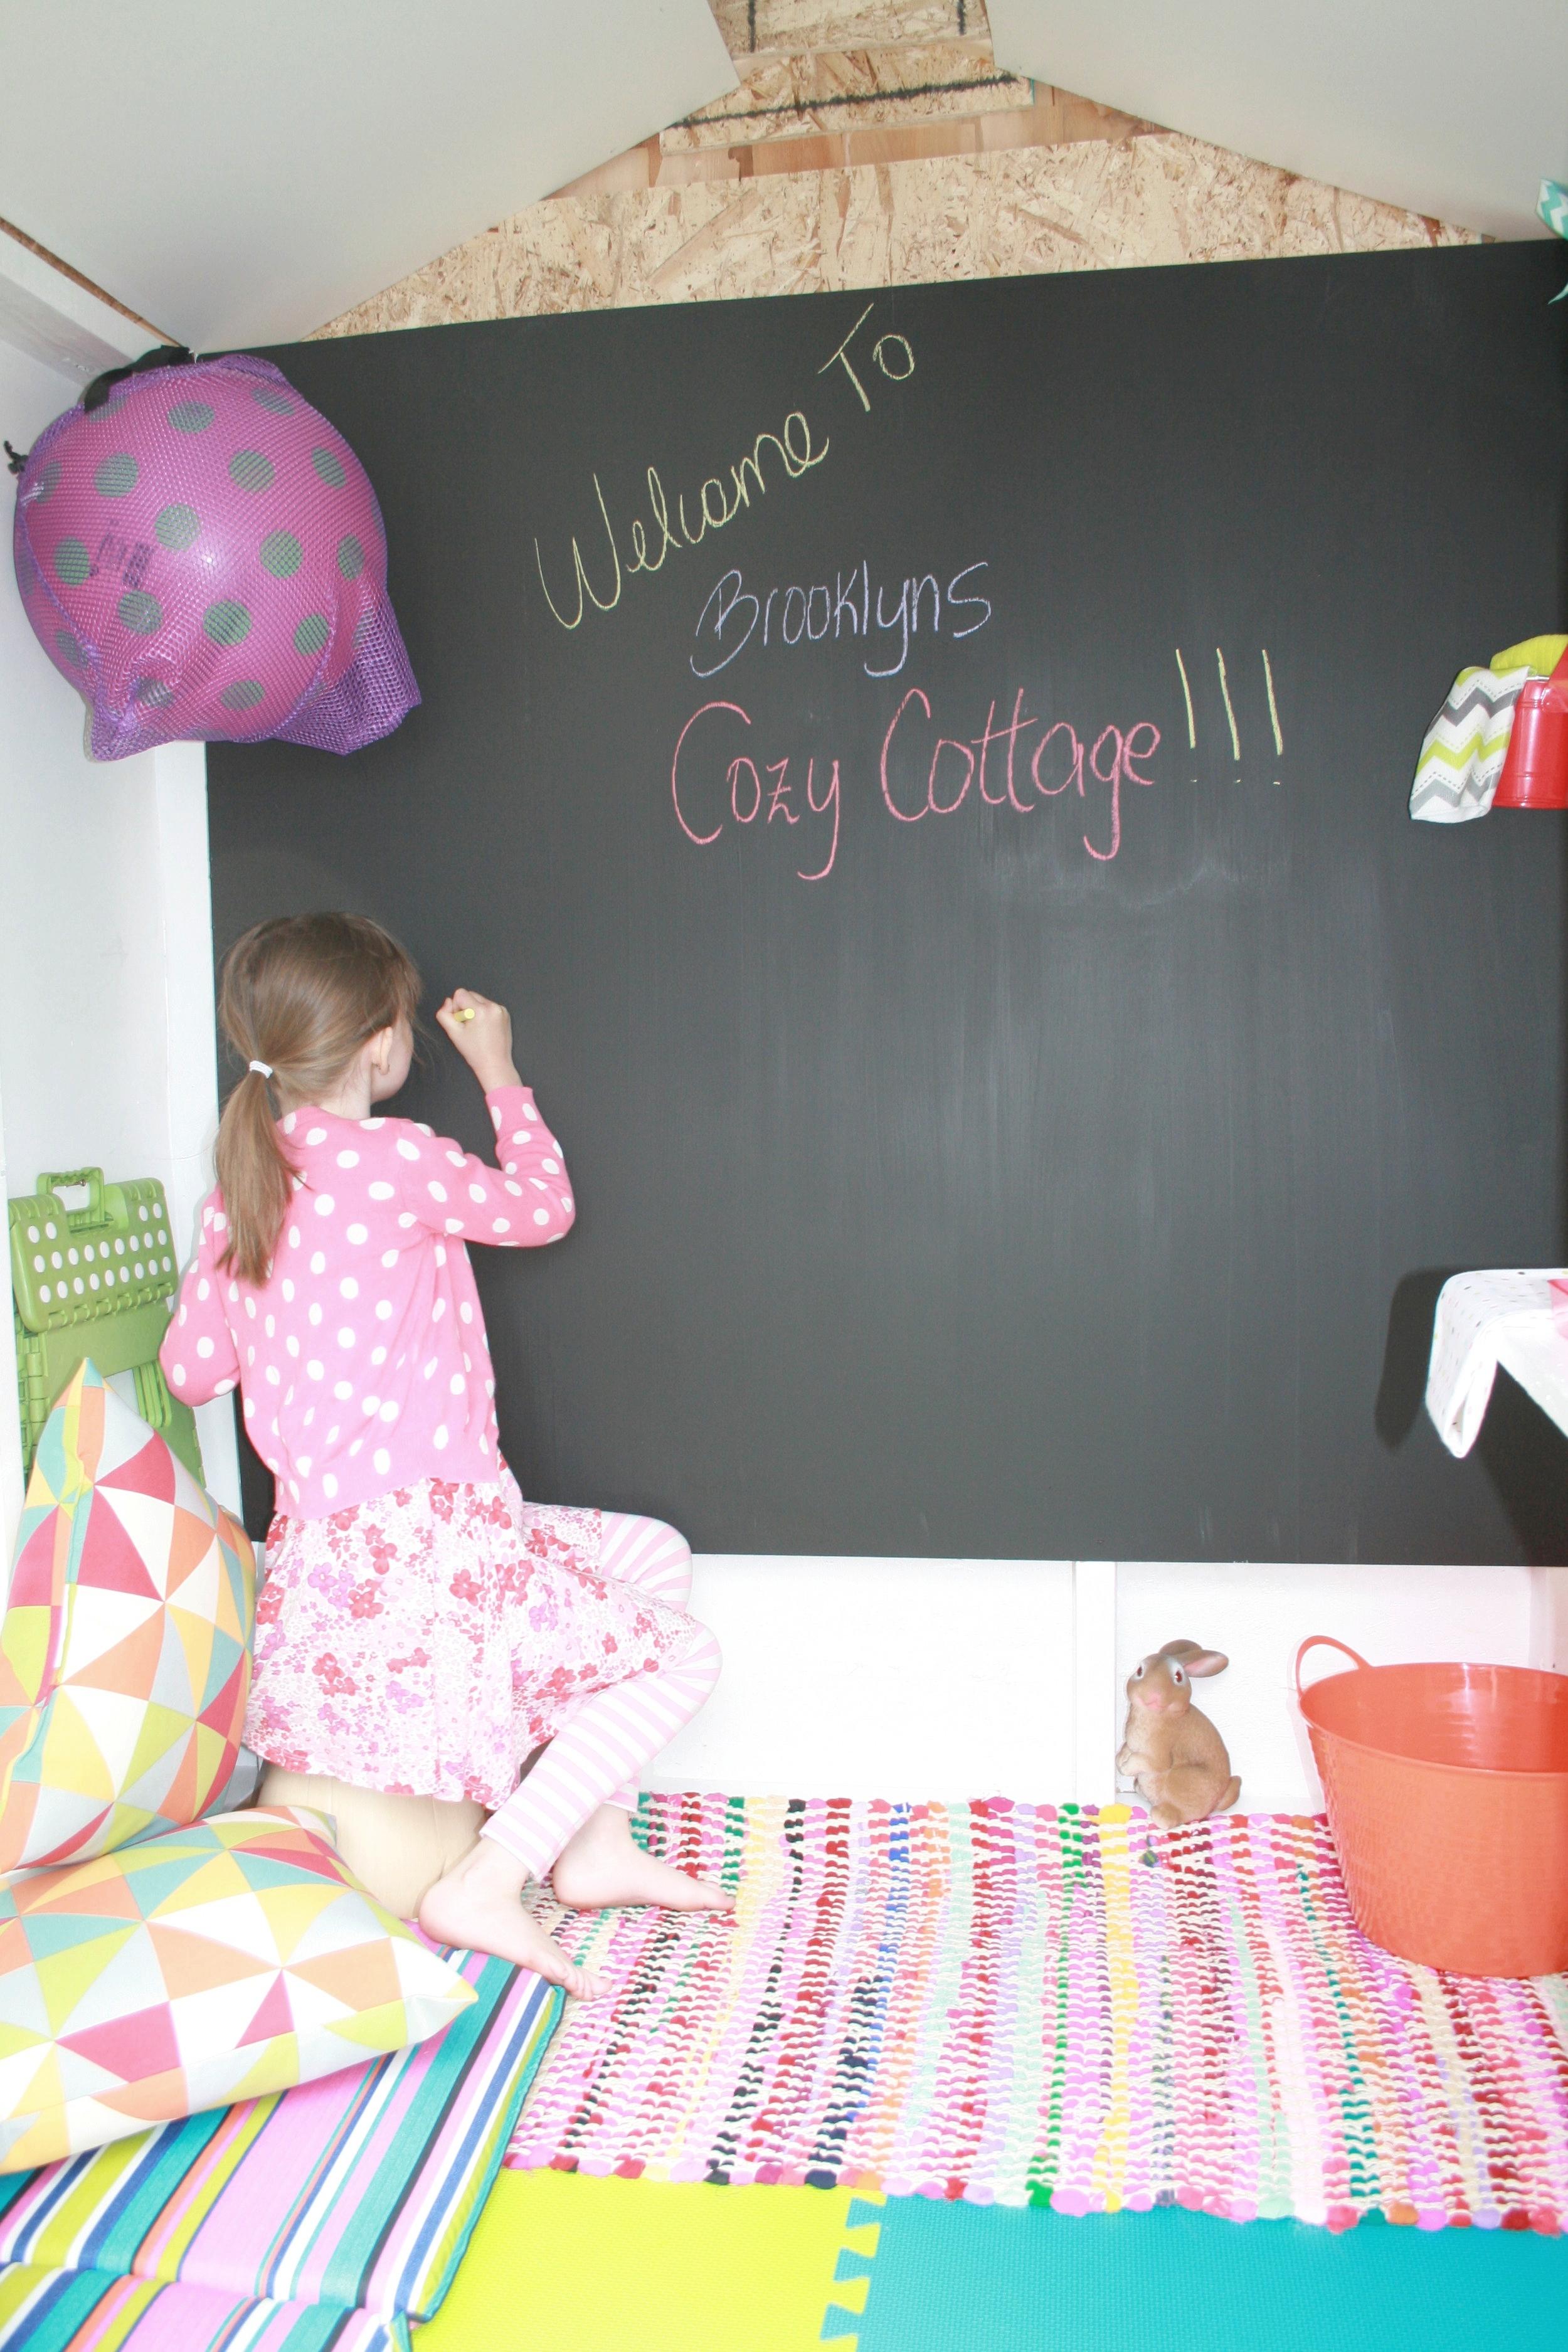 Cozy Cottage Playhouse